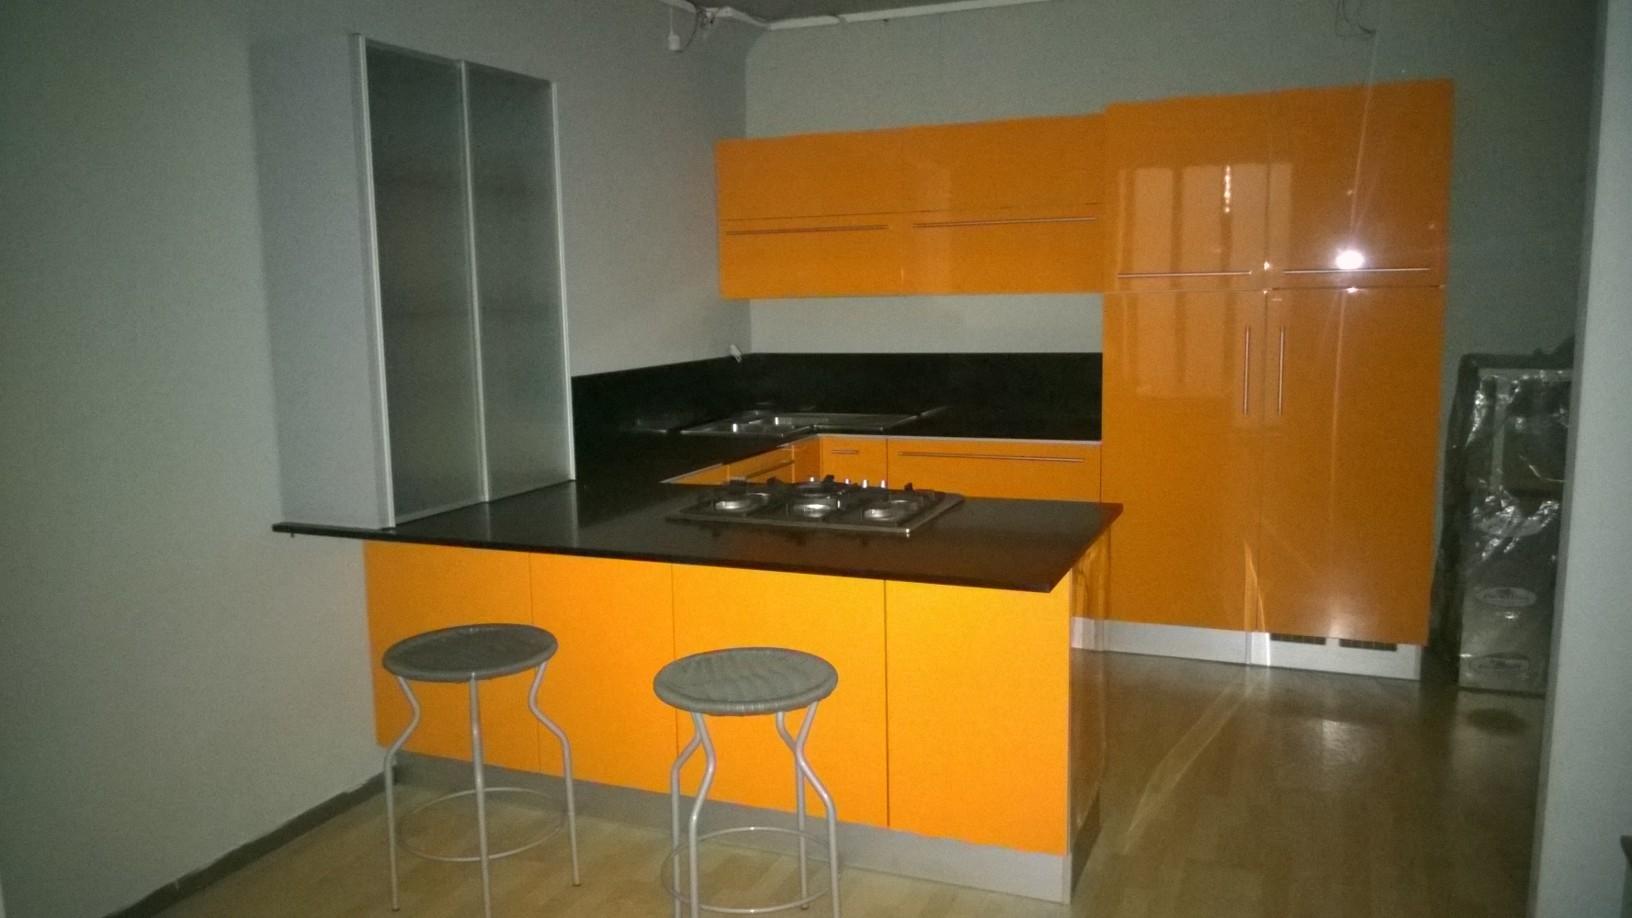 Berloni Cucine Cucina Cromatica Scontato Del  71 % Cucine A Prezzi  #C98902 1632 918 Berloni O Veneta Cucine